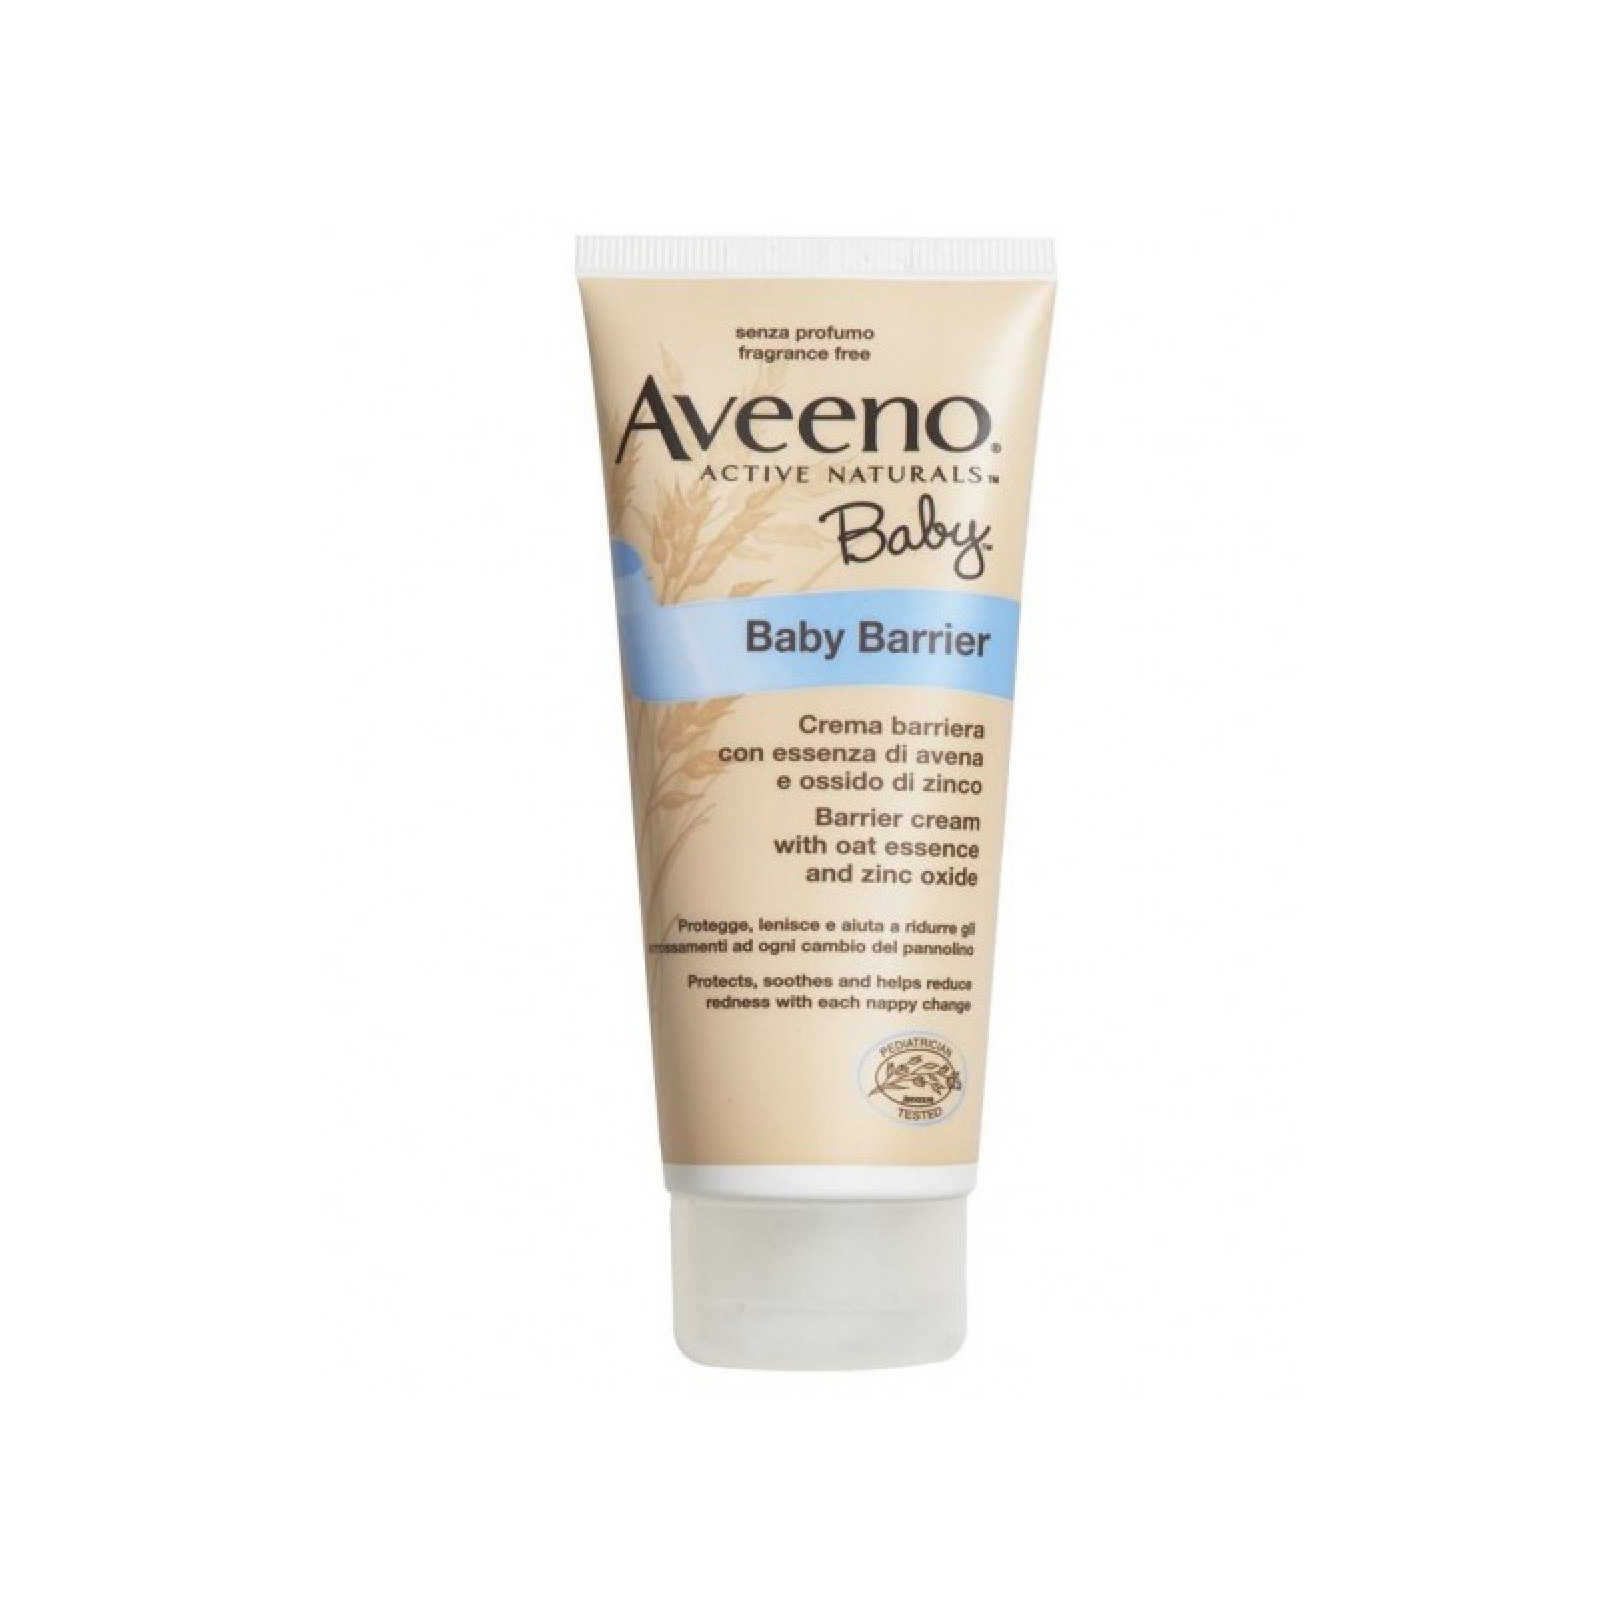 Aveeno - Baby Barrier - Crema Barriera